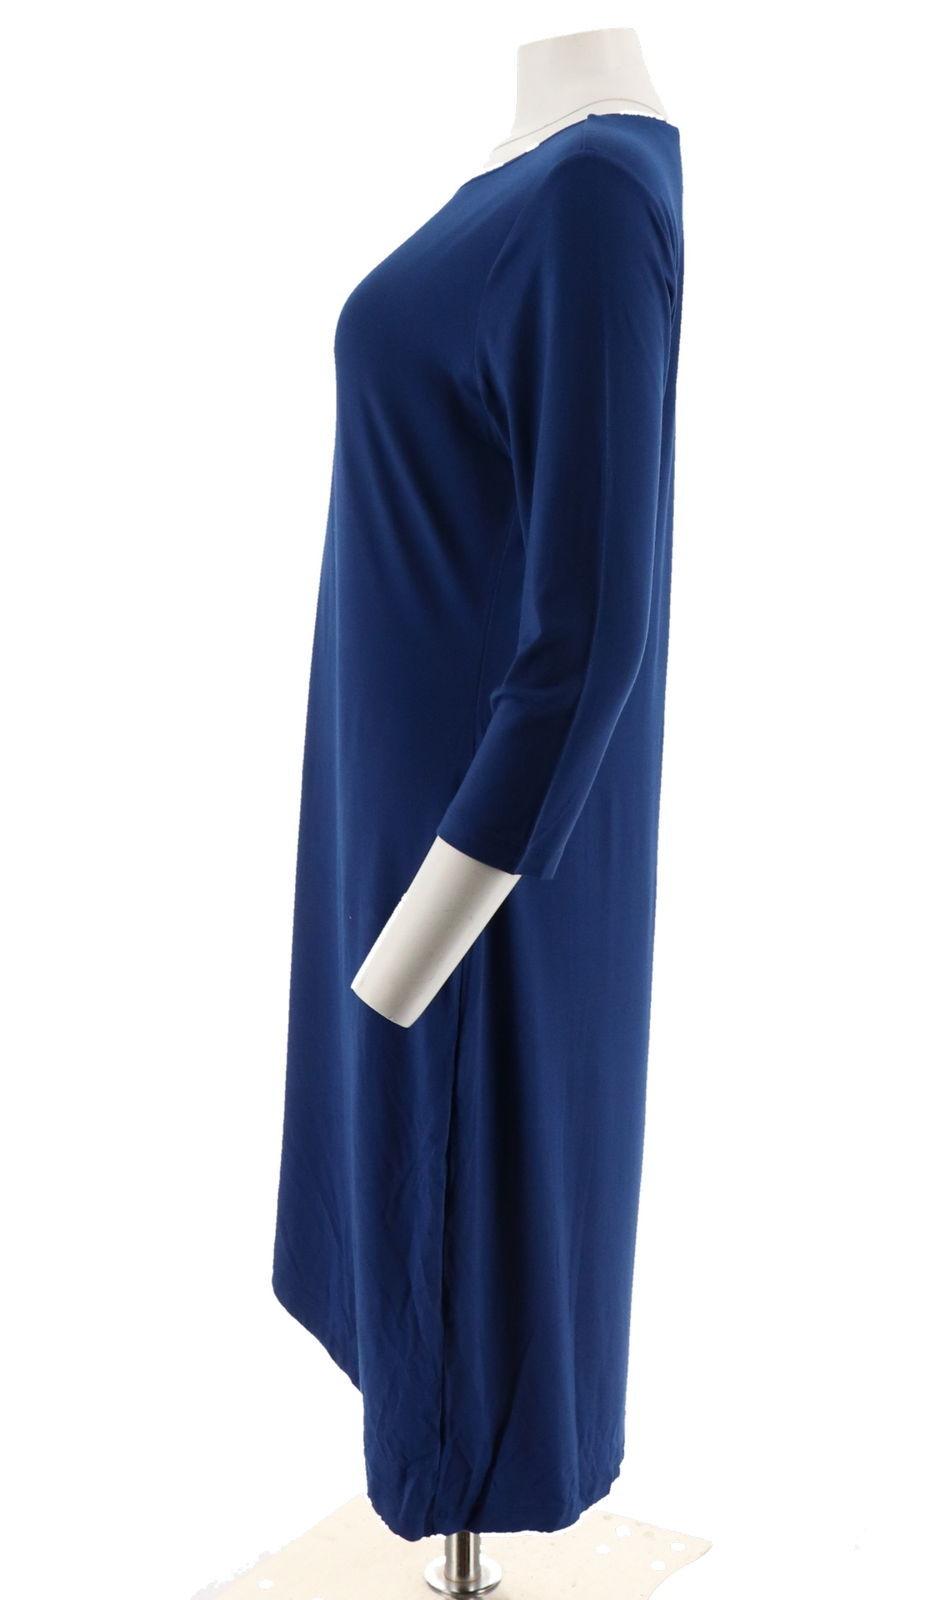 Halston 3/4 Slv Draped Front Crewneck Hi-Low Hem Dress Royal Blue XS NEW A280164 image 2